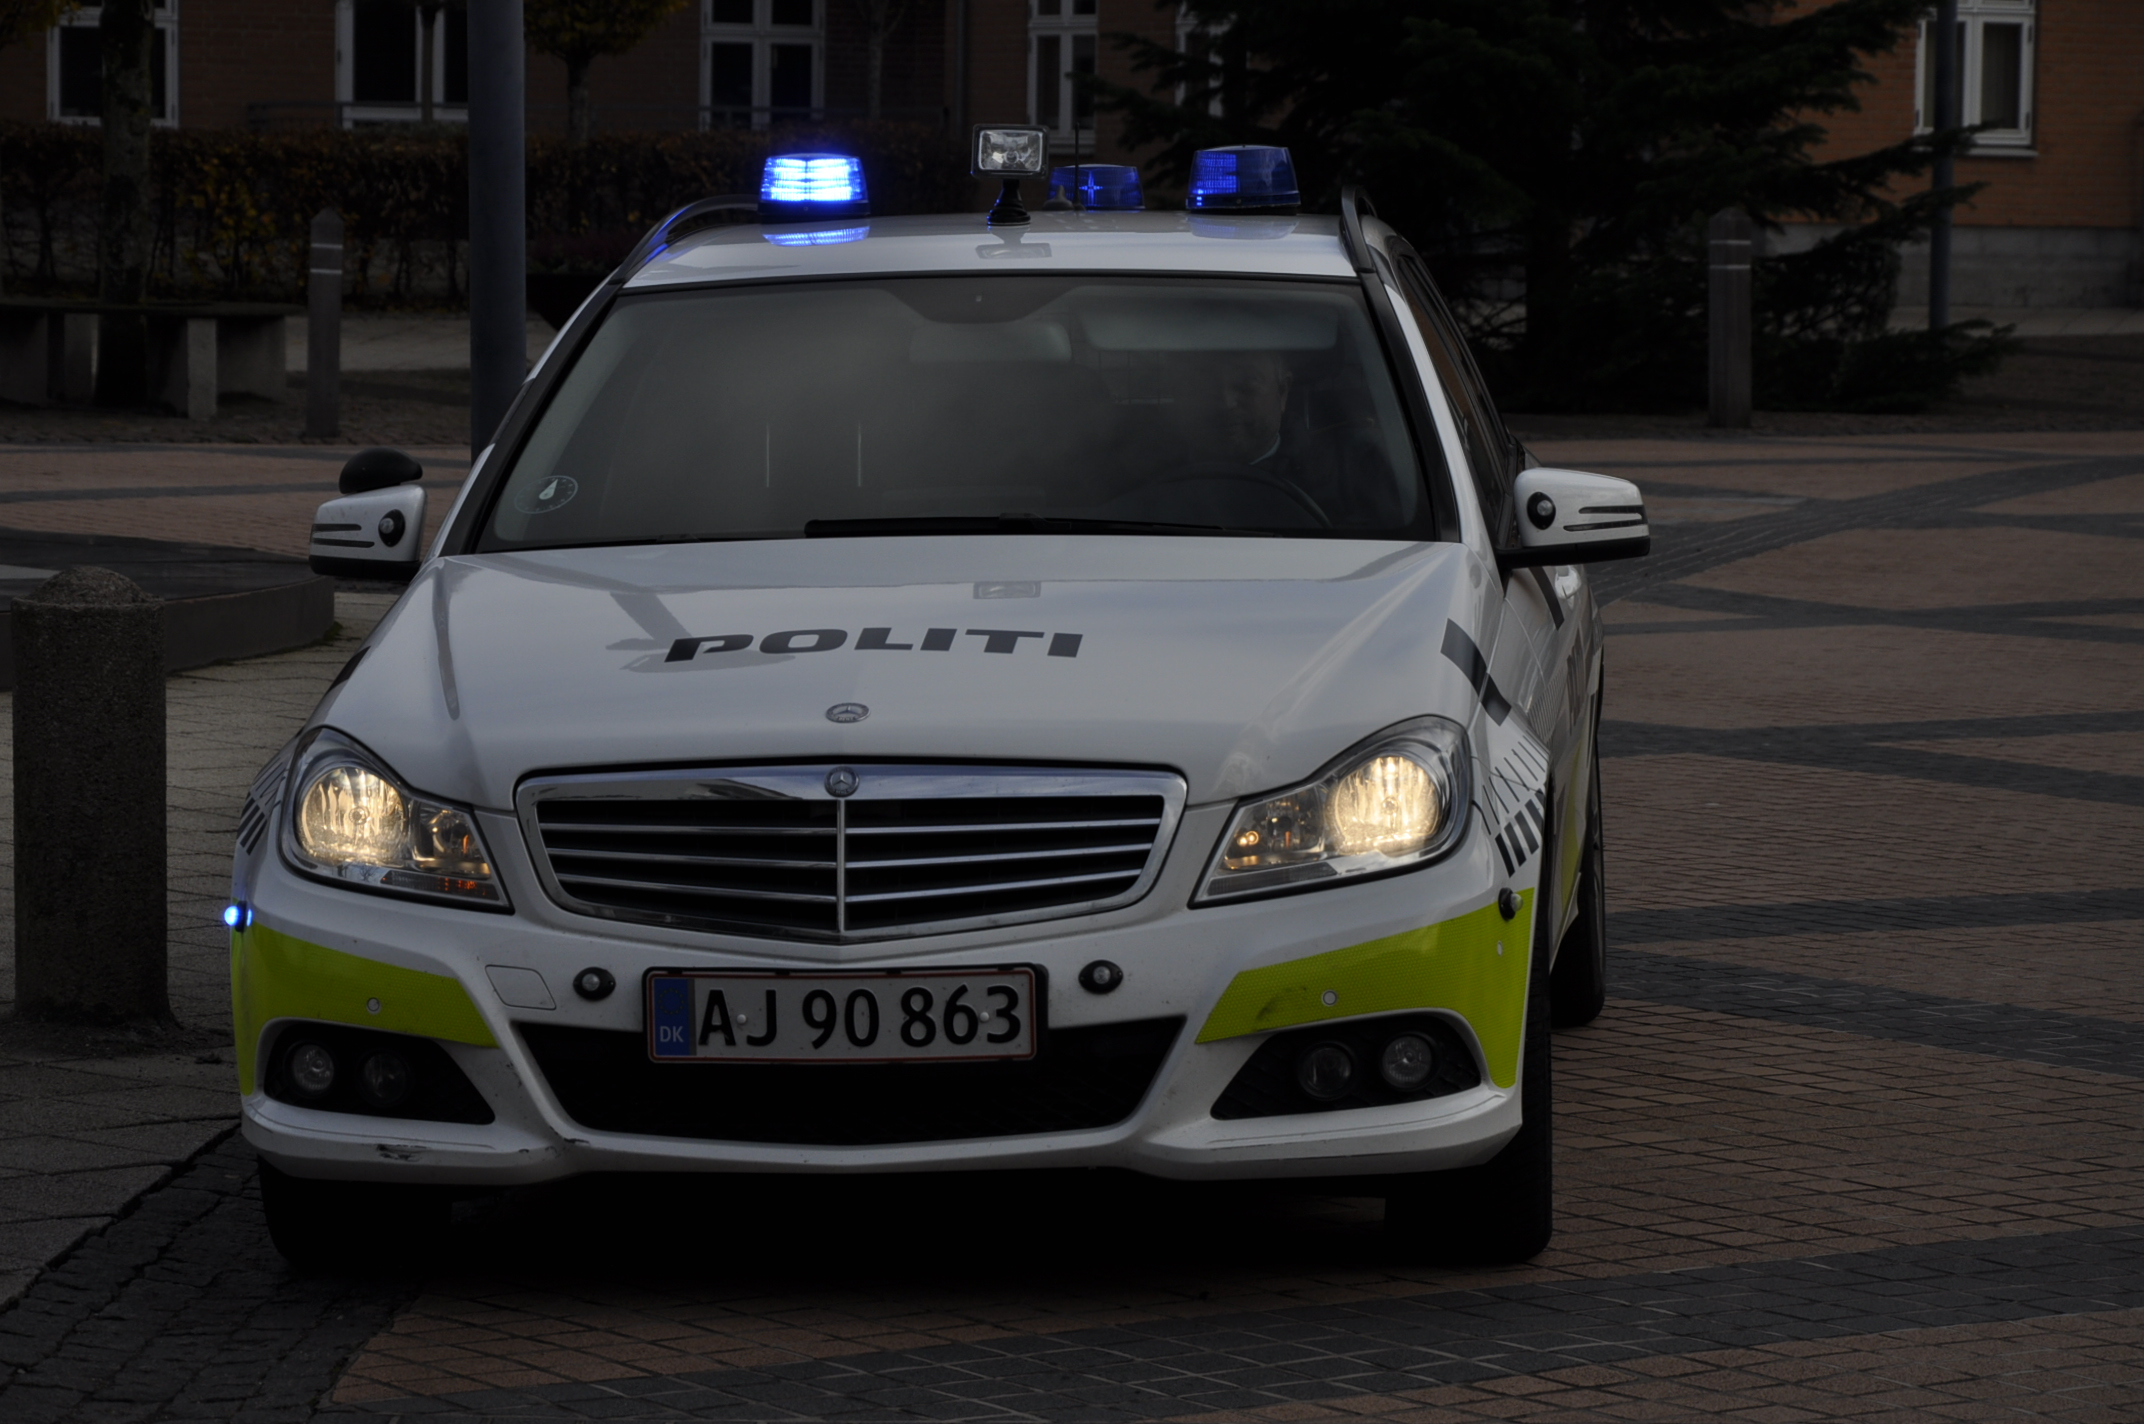 Politiet havde en relativt rolig nytårsaften.